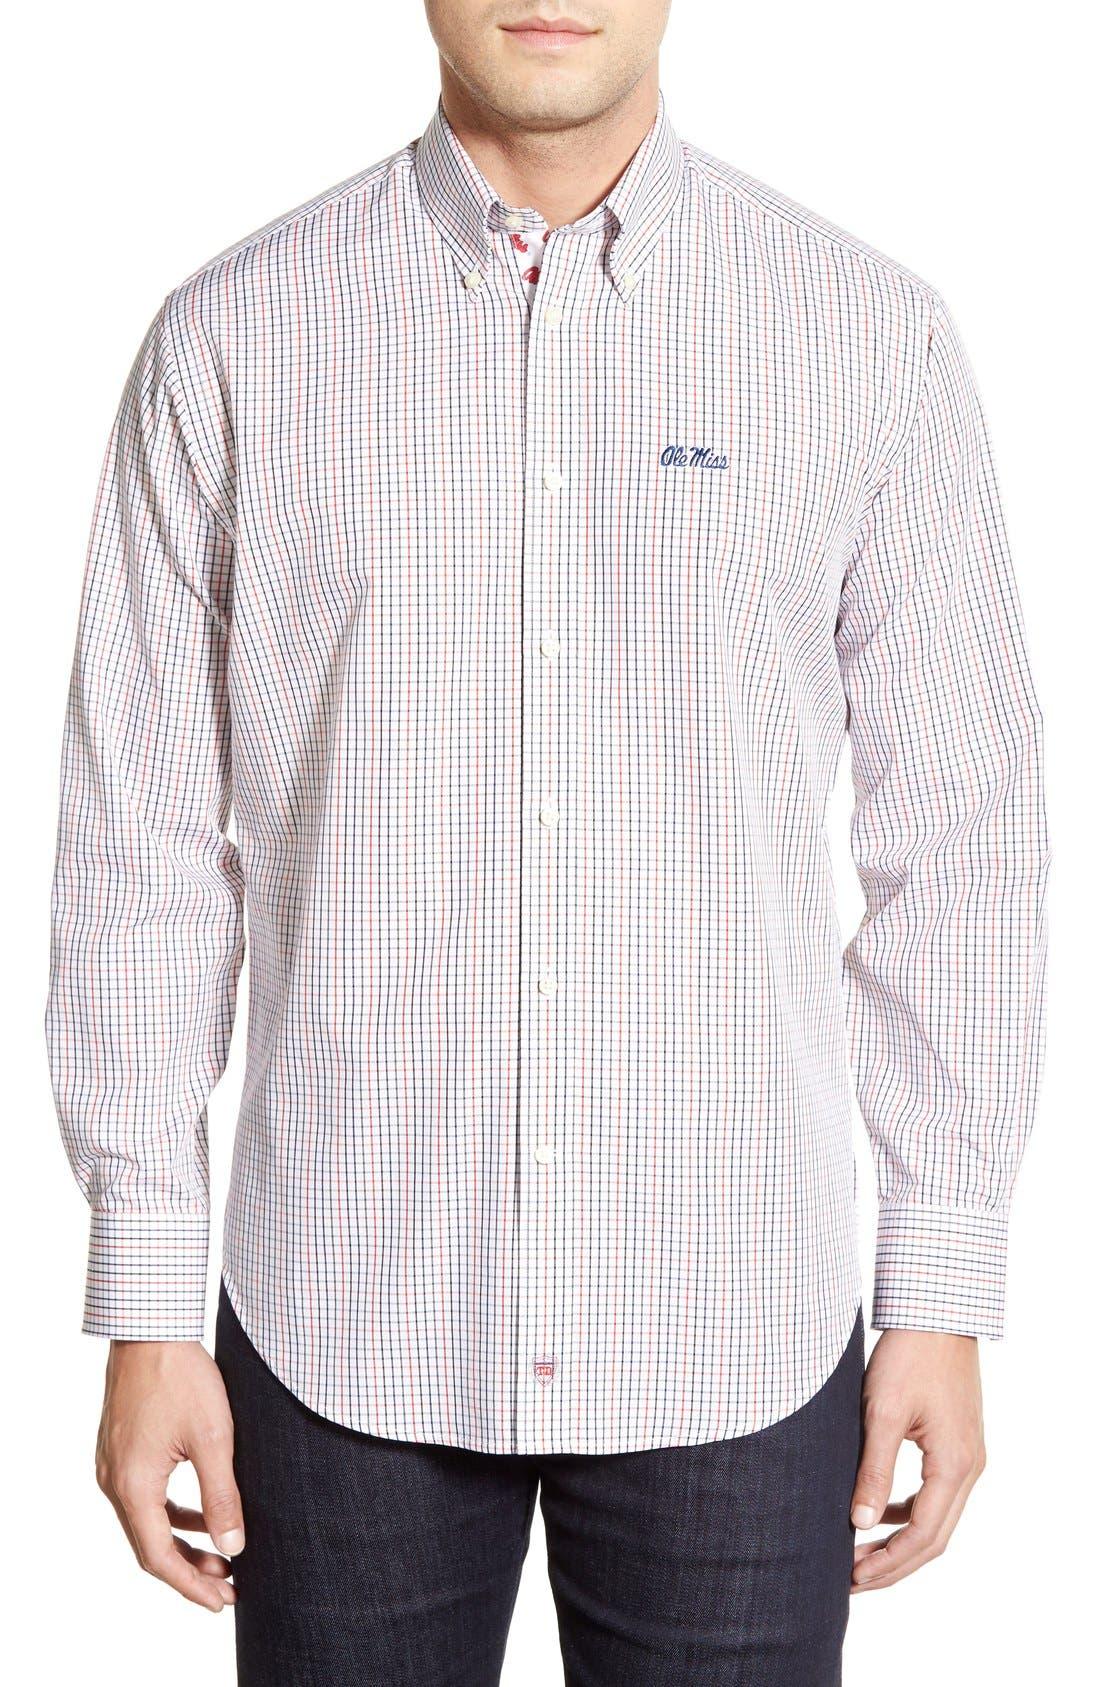 Main Image - Thomas Dean 'Ole Miss Rebels' Regular Fit Long Sleeve Tattersall Sport Shirt